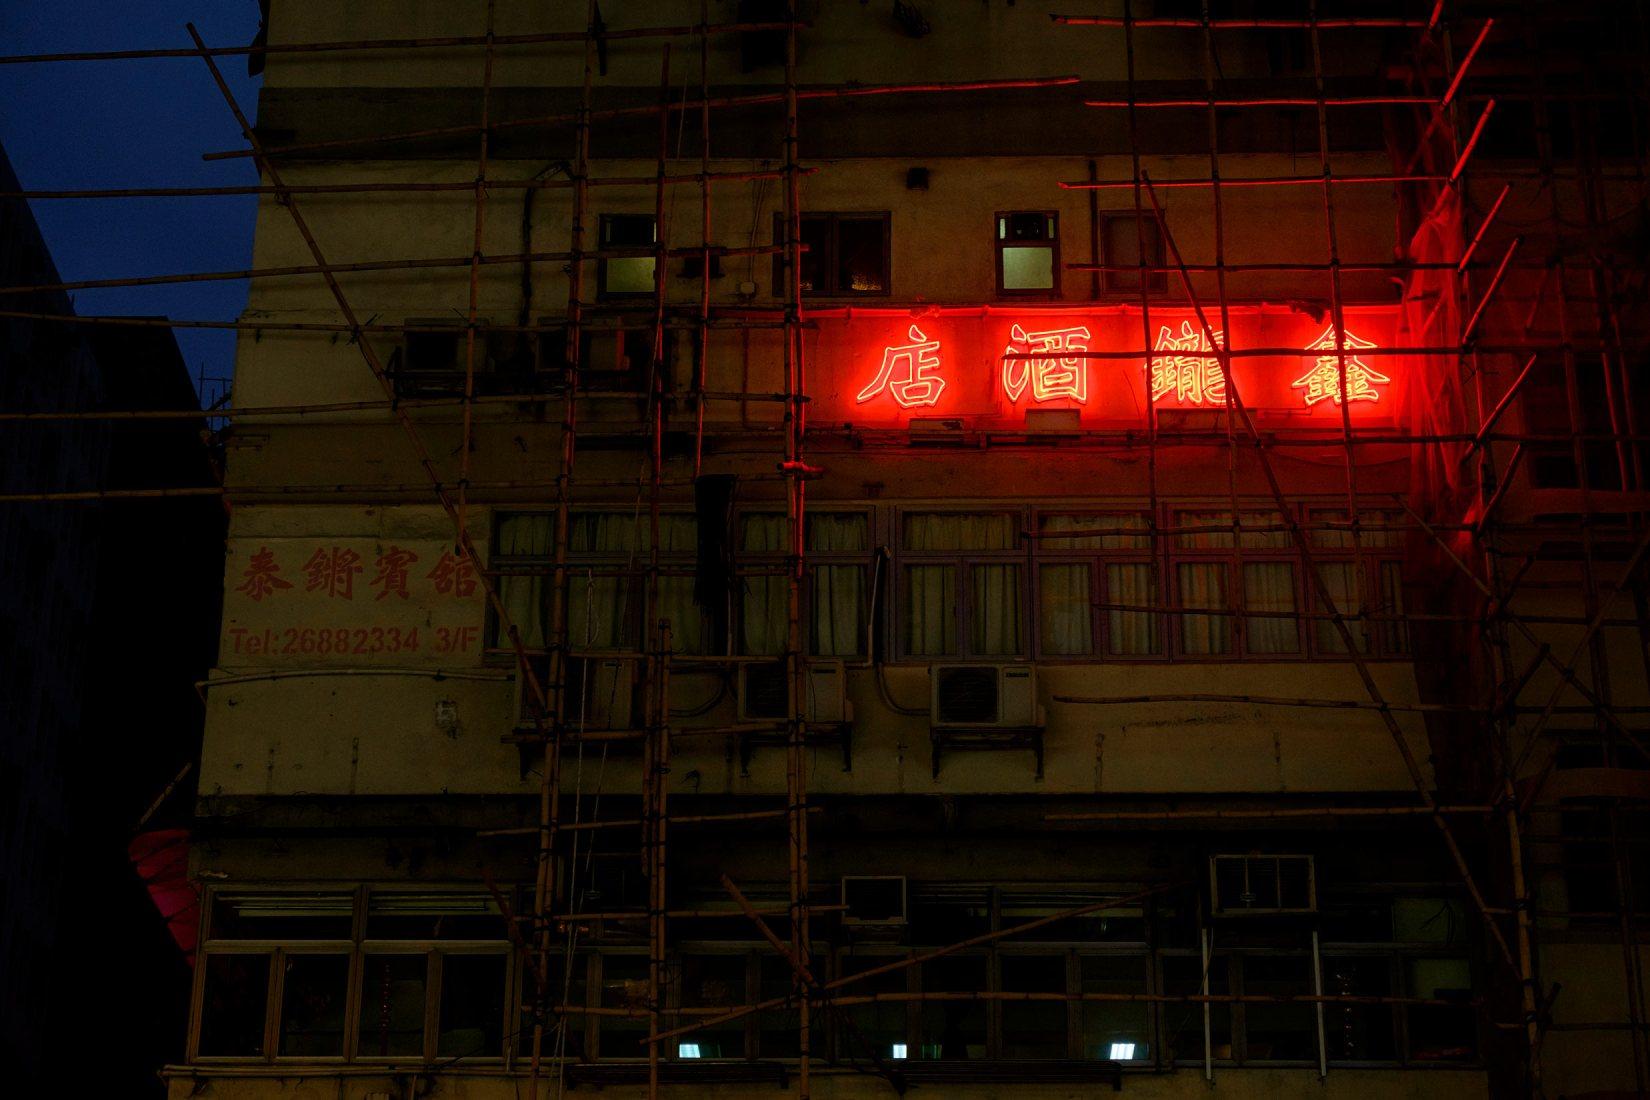 PWS020-0478-Sharon-Blance-Melbourne-photographer-Hong-Kong-neon